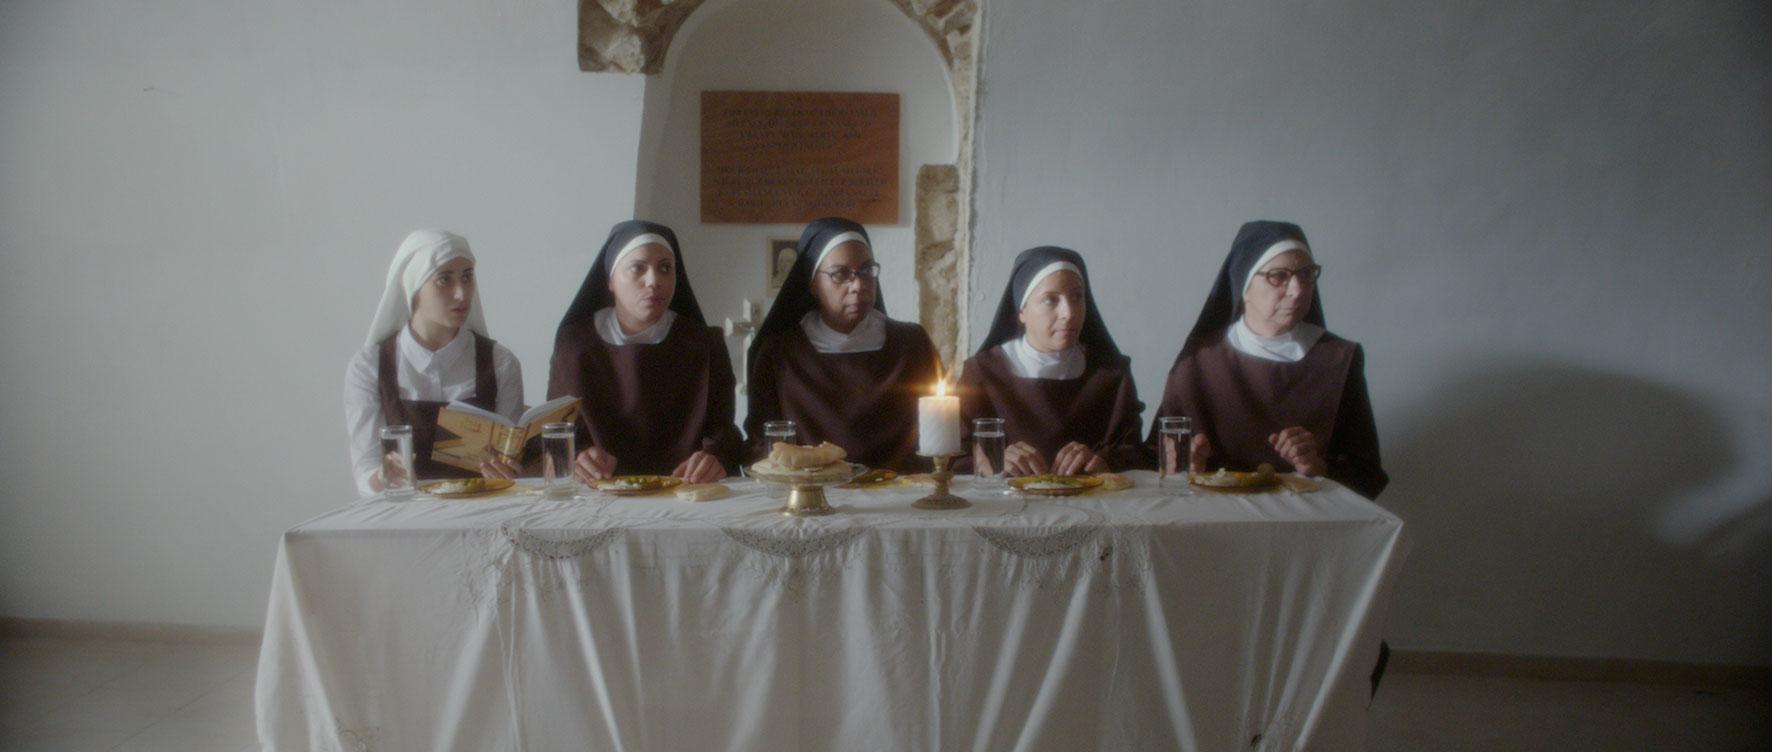 6 Ave Maria